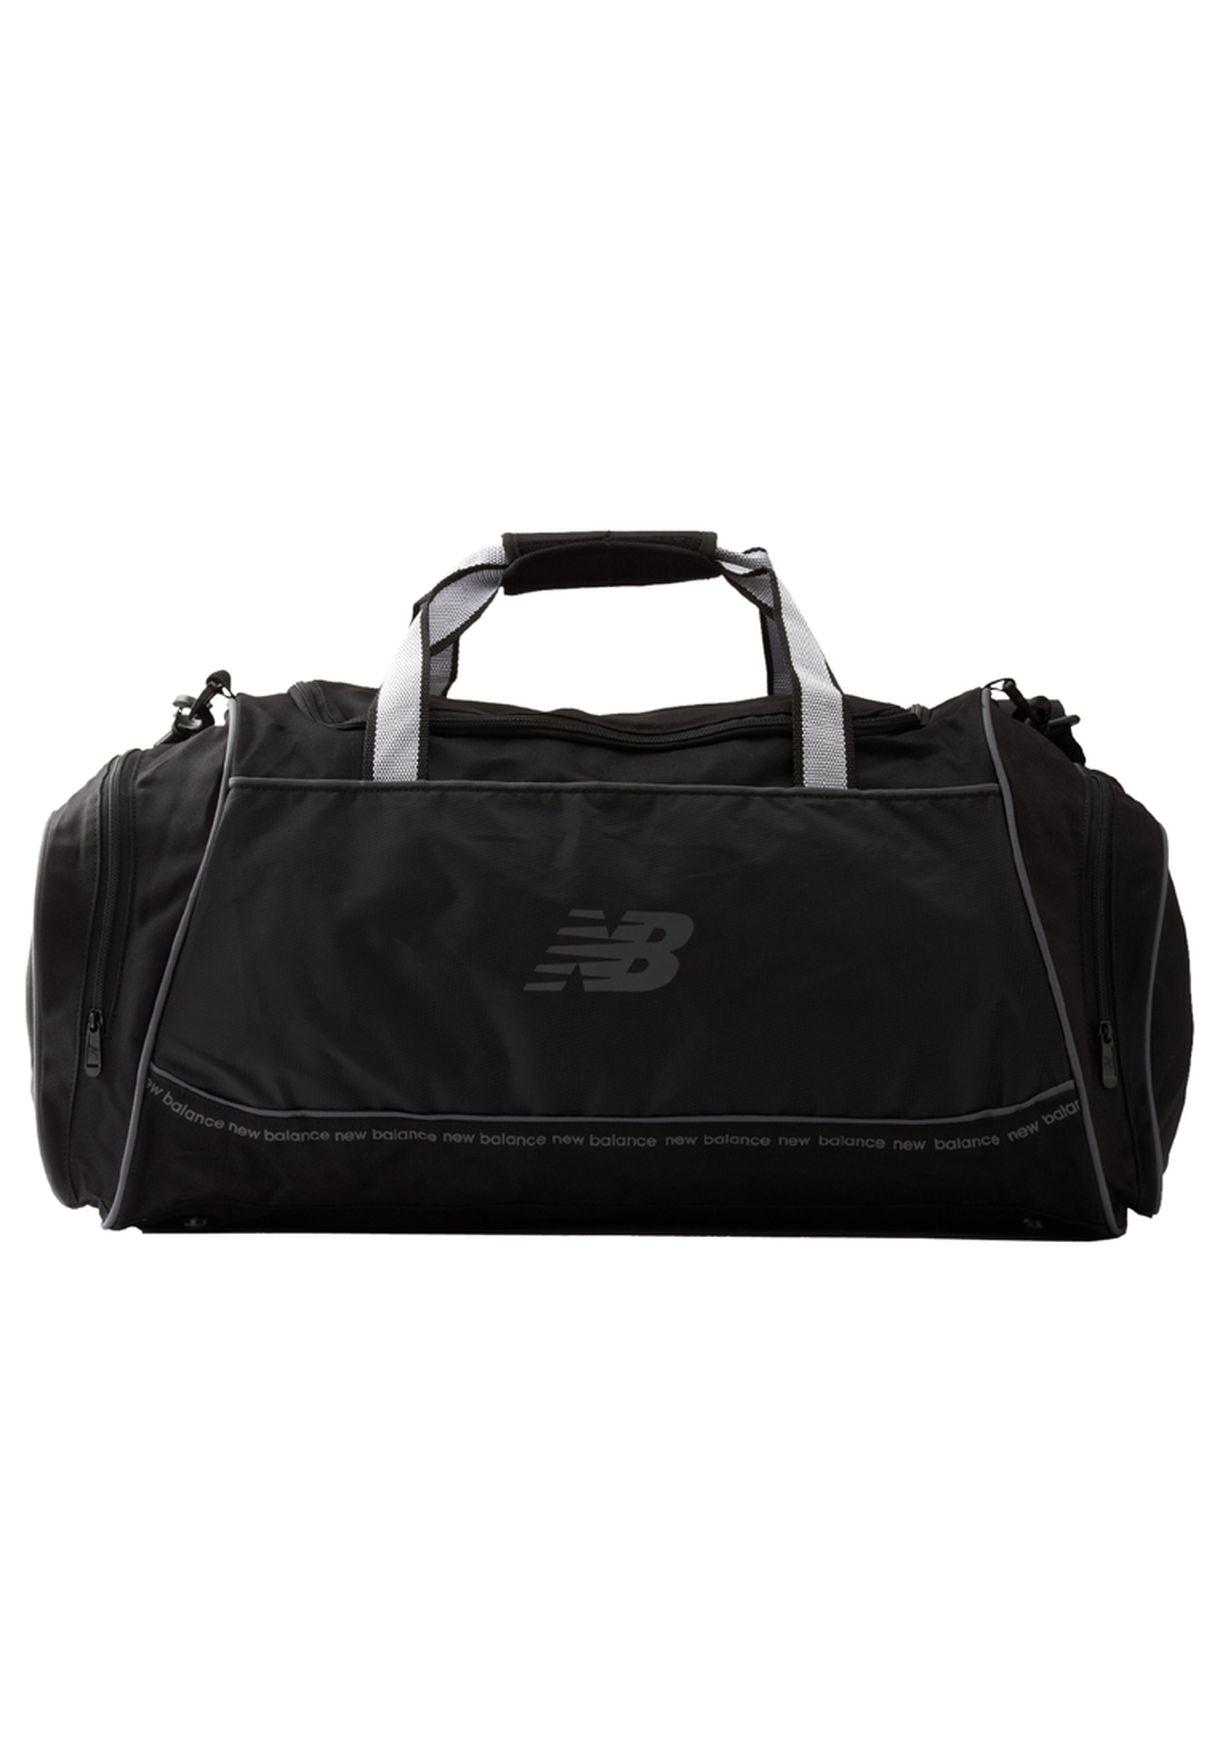 310a33aa15b21 Shop New Balance black NB-066L - Momentum Large Duffle for Men in ...